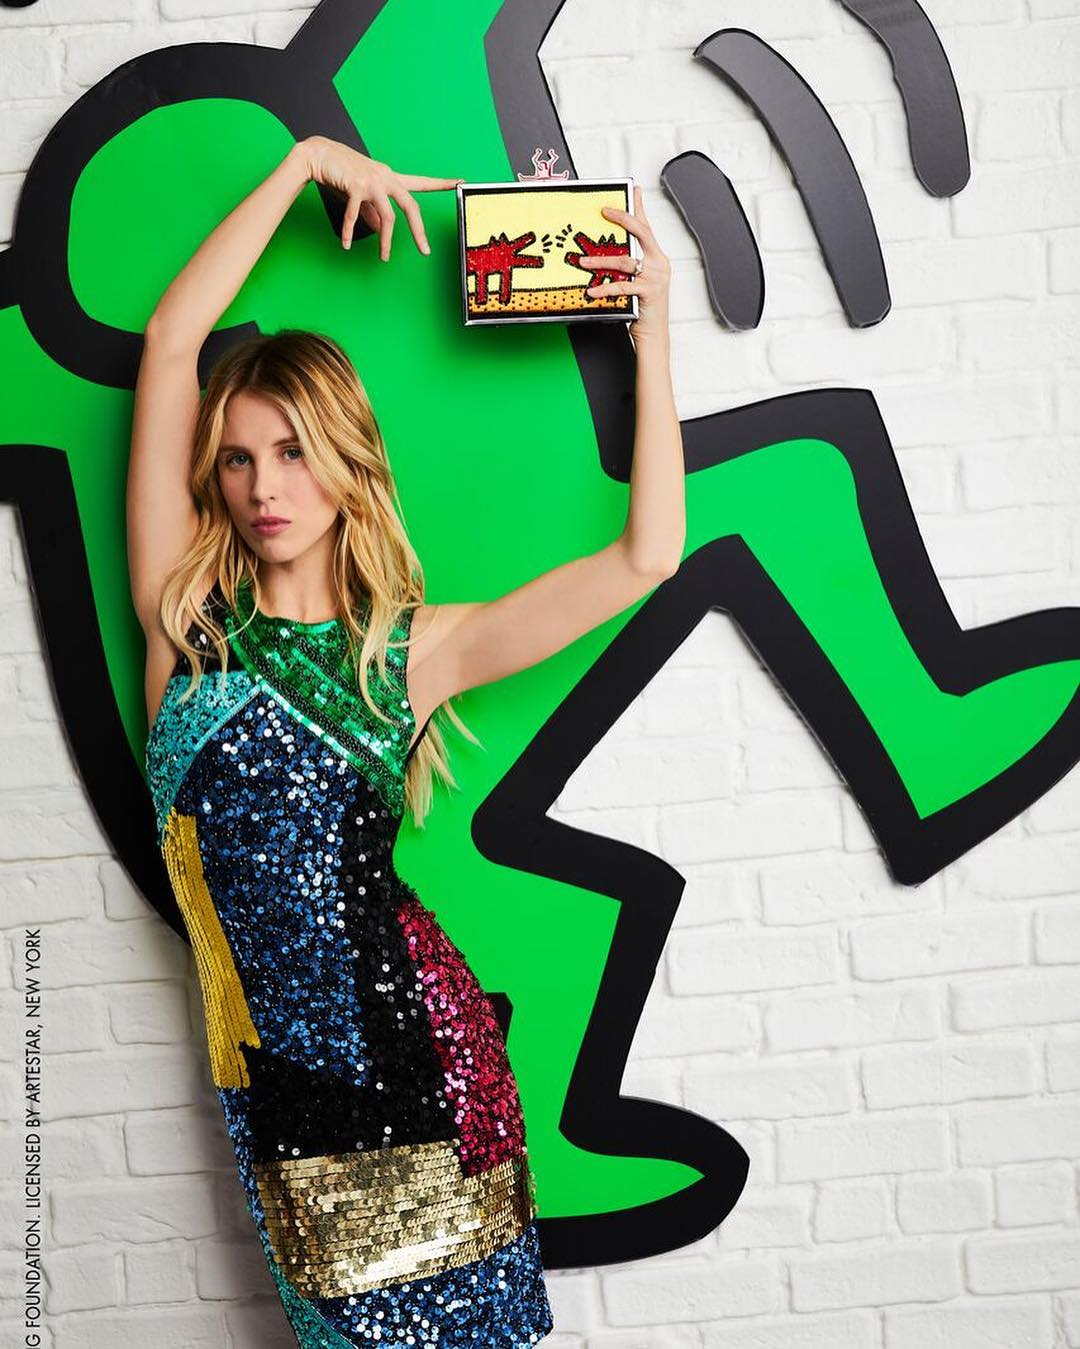 Boohoo Com X Paris Hilton New Collaboration: Barron Hilton And Tessa Hilton For Keith Haring X Alice